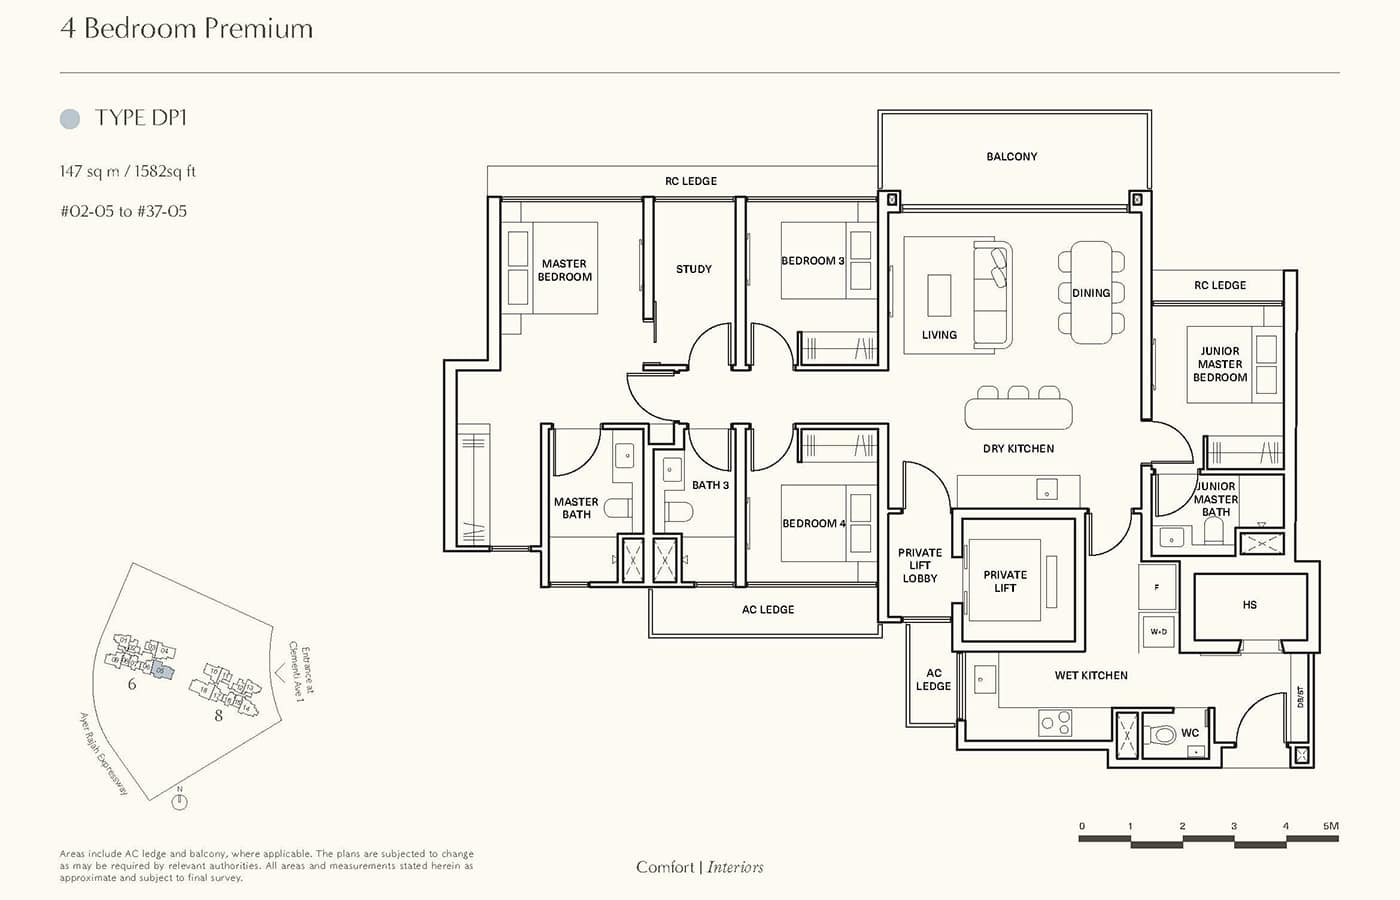 Clavon Condo Floor Plans - 4 Bedroom Premium DP1